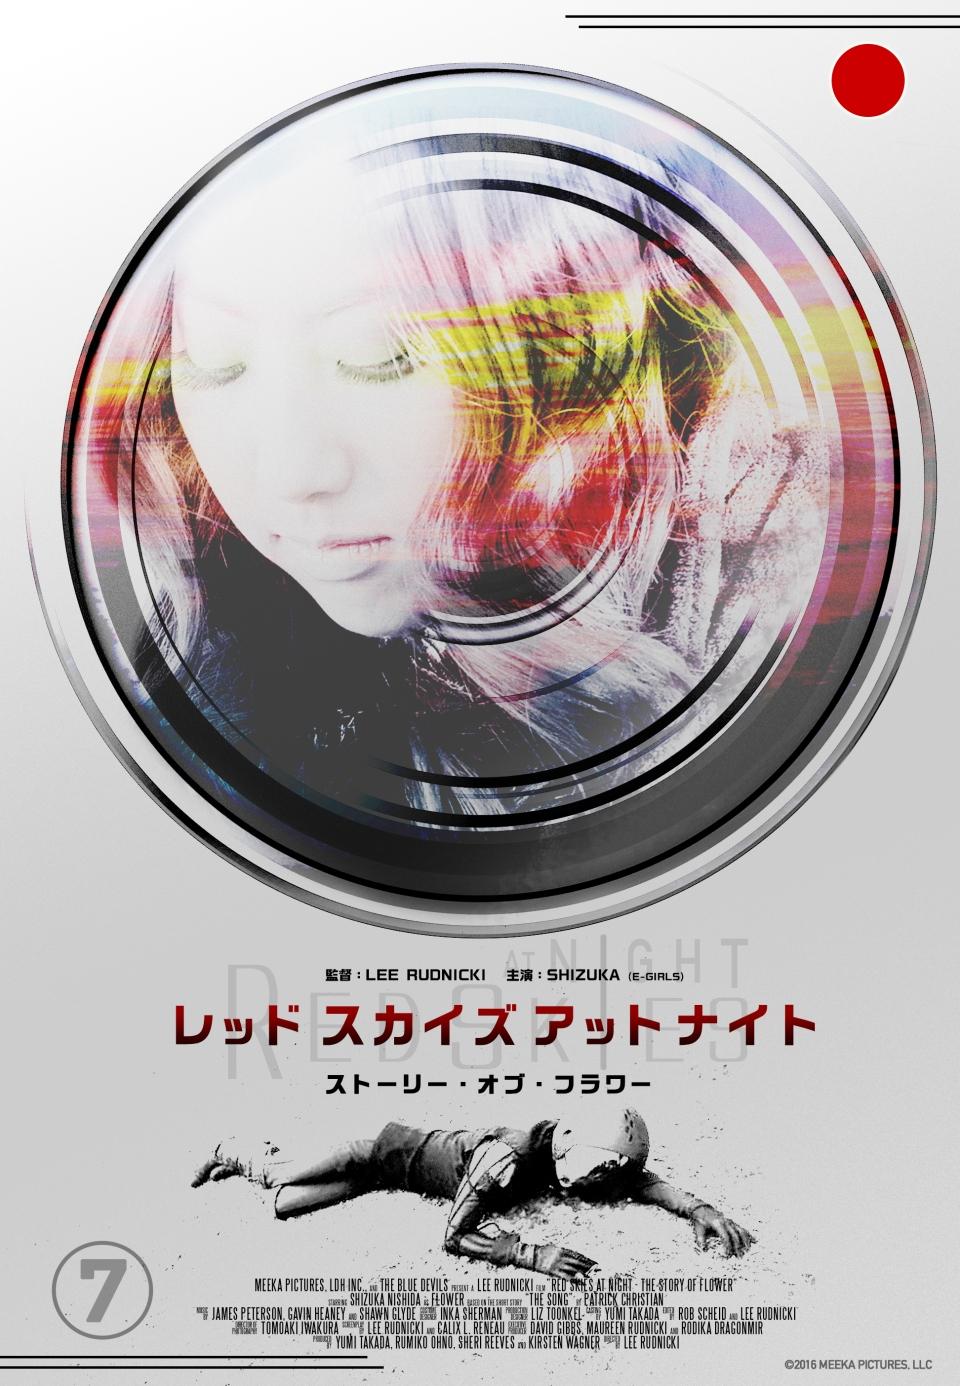 Red-Skies-at-Night---Poster3_J_revised